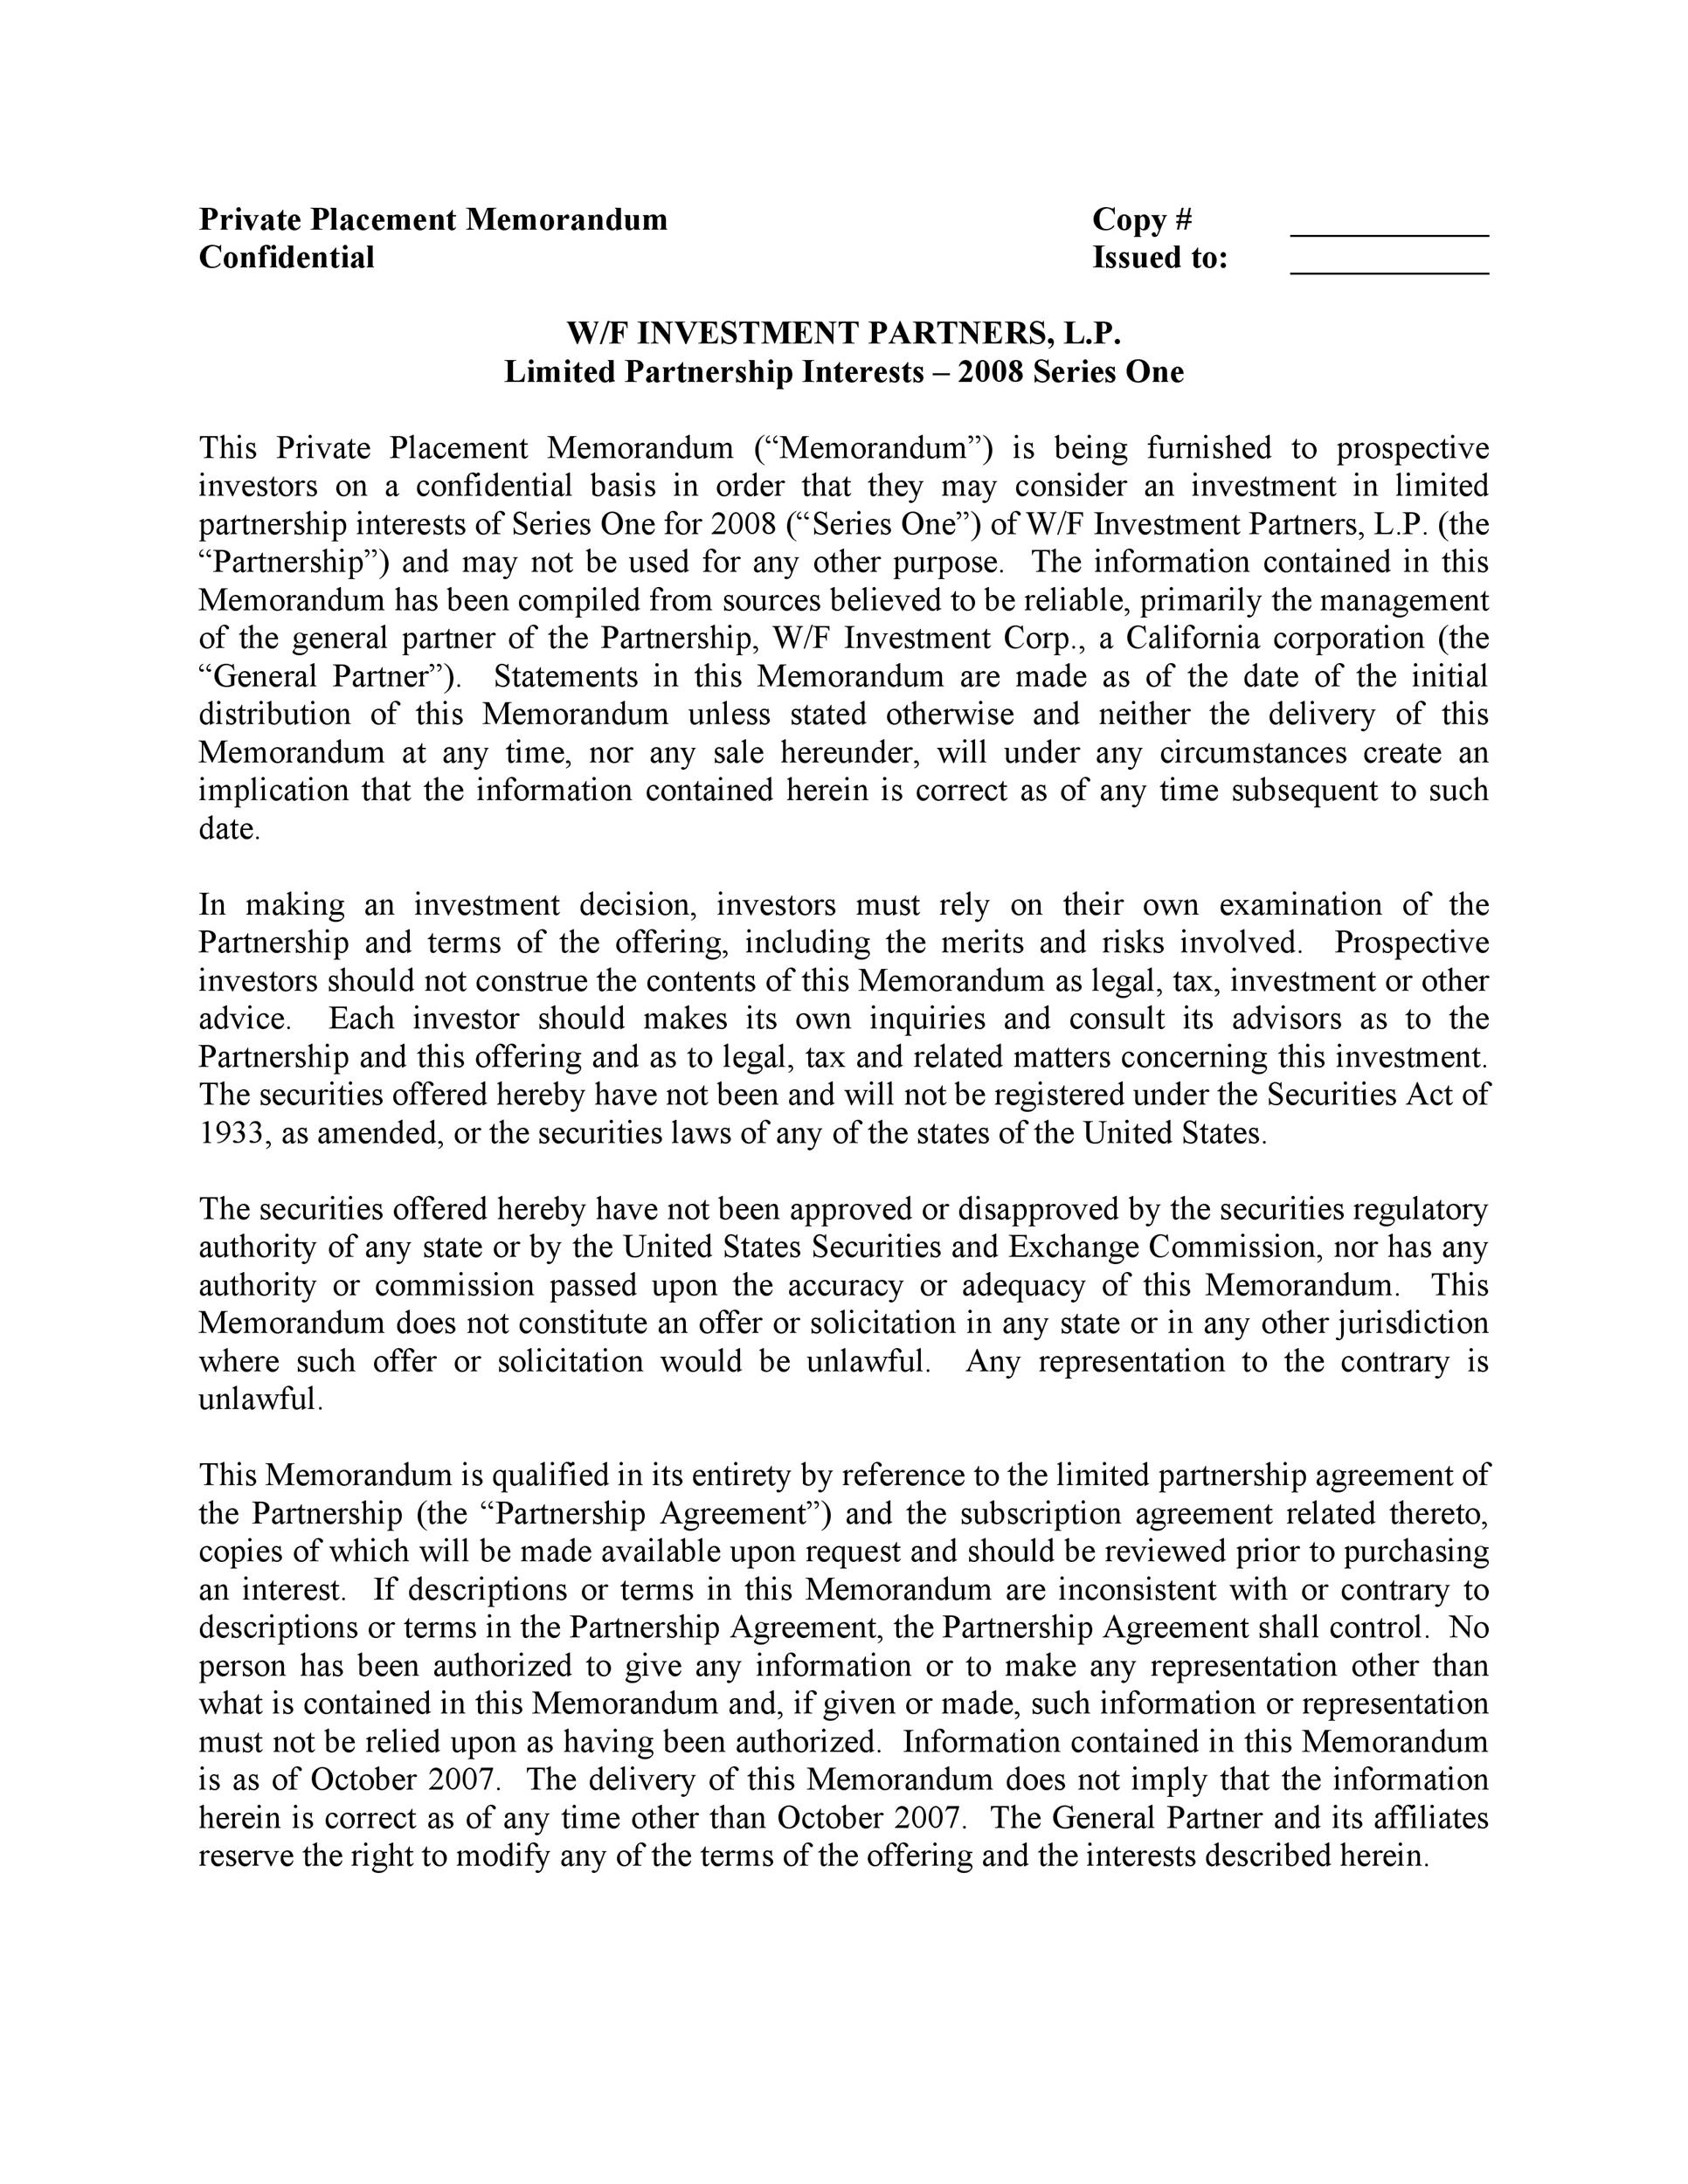 Free private placement memorandum template 10